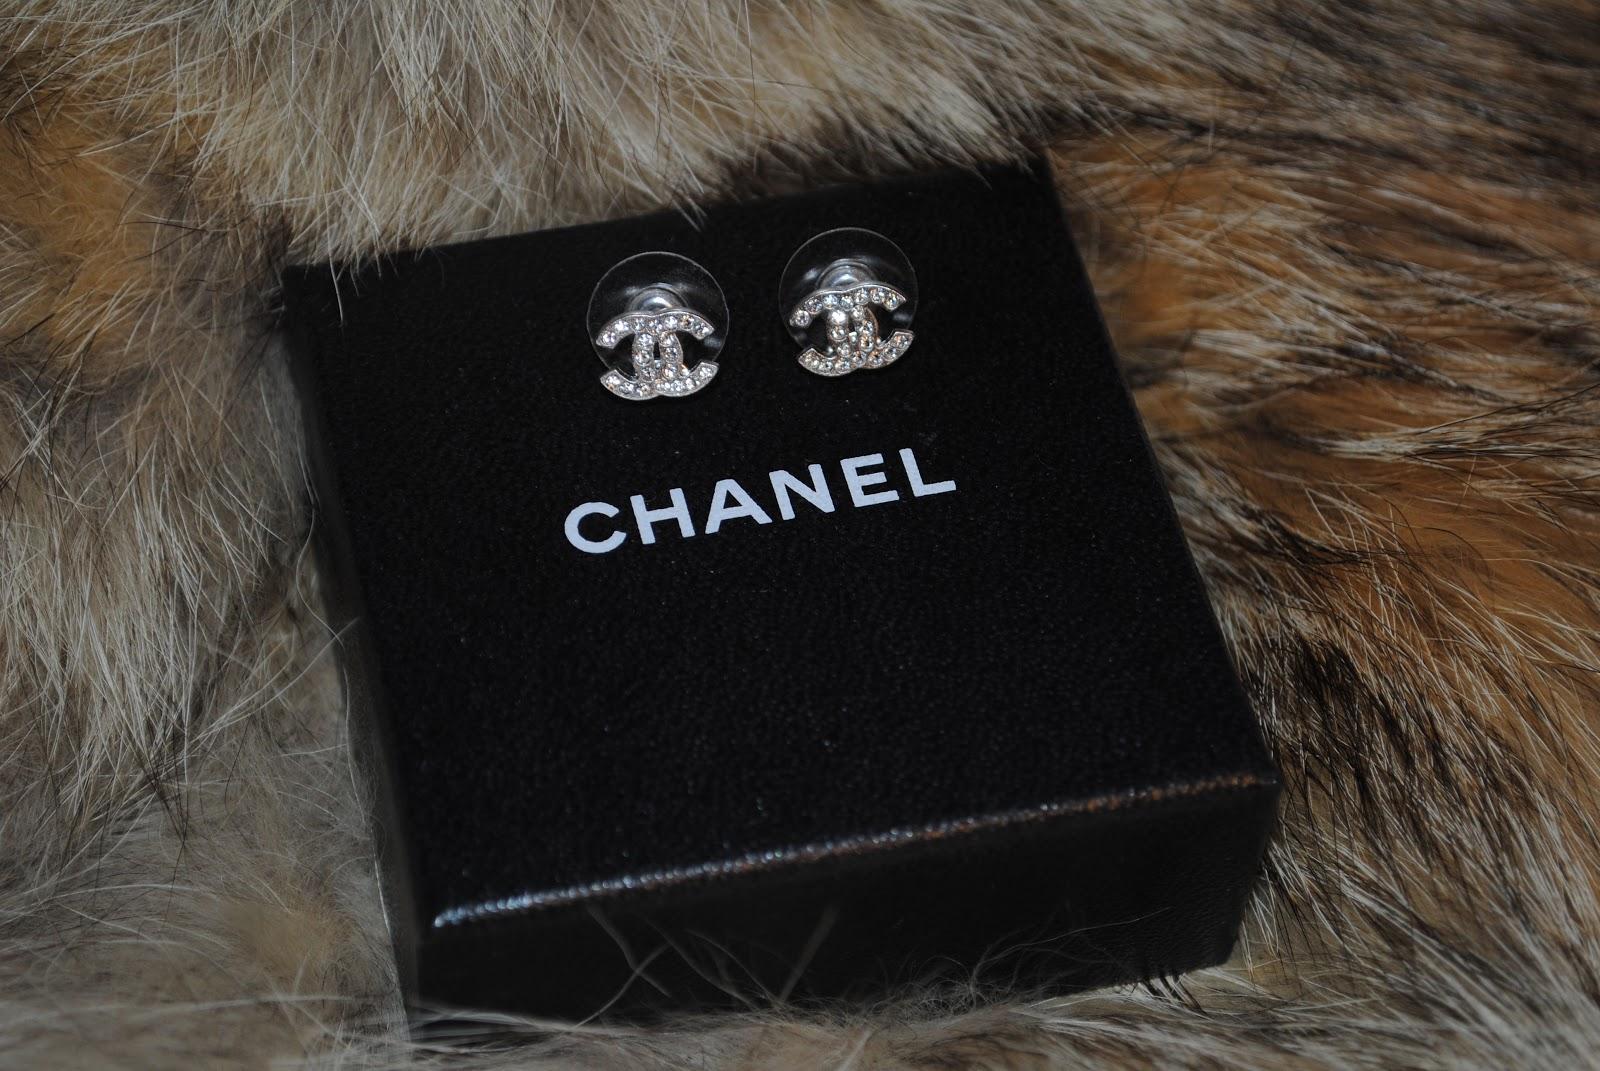 janinchen von w new in chanel stud earrings. Black Bedroom Furniture Sets. Home Design Ideas